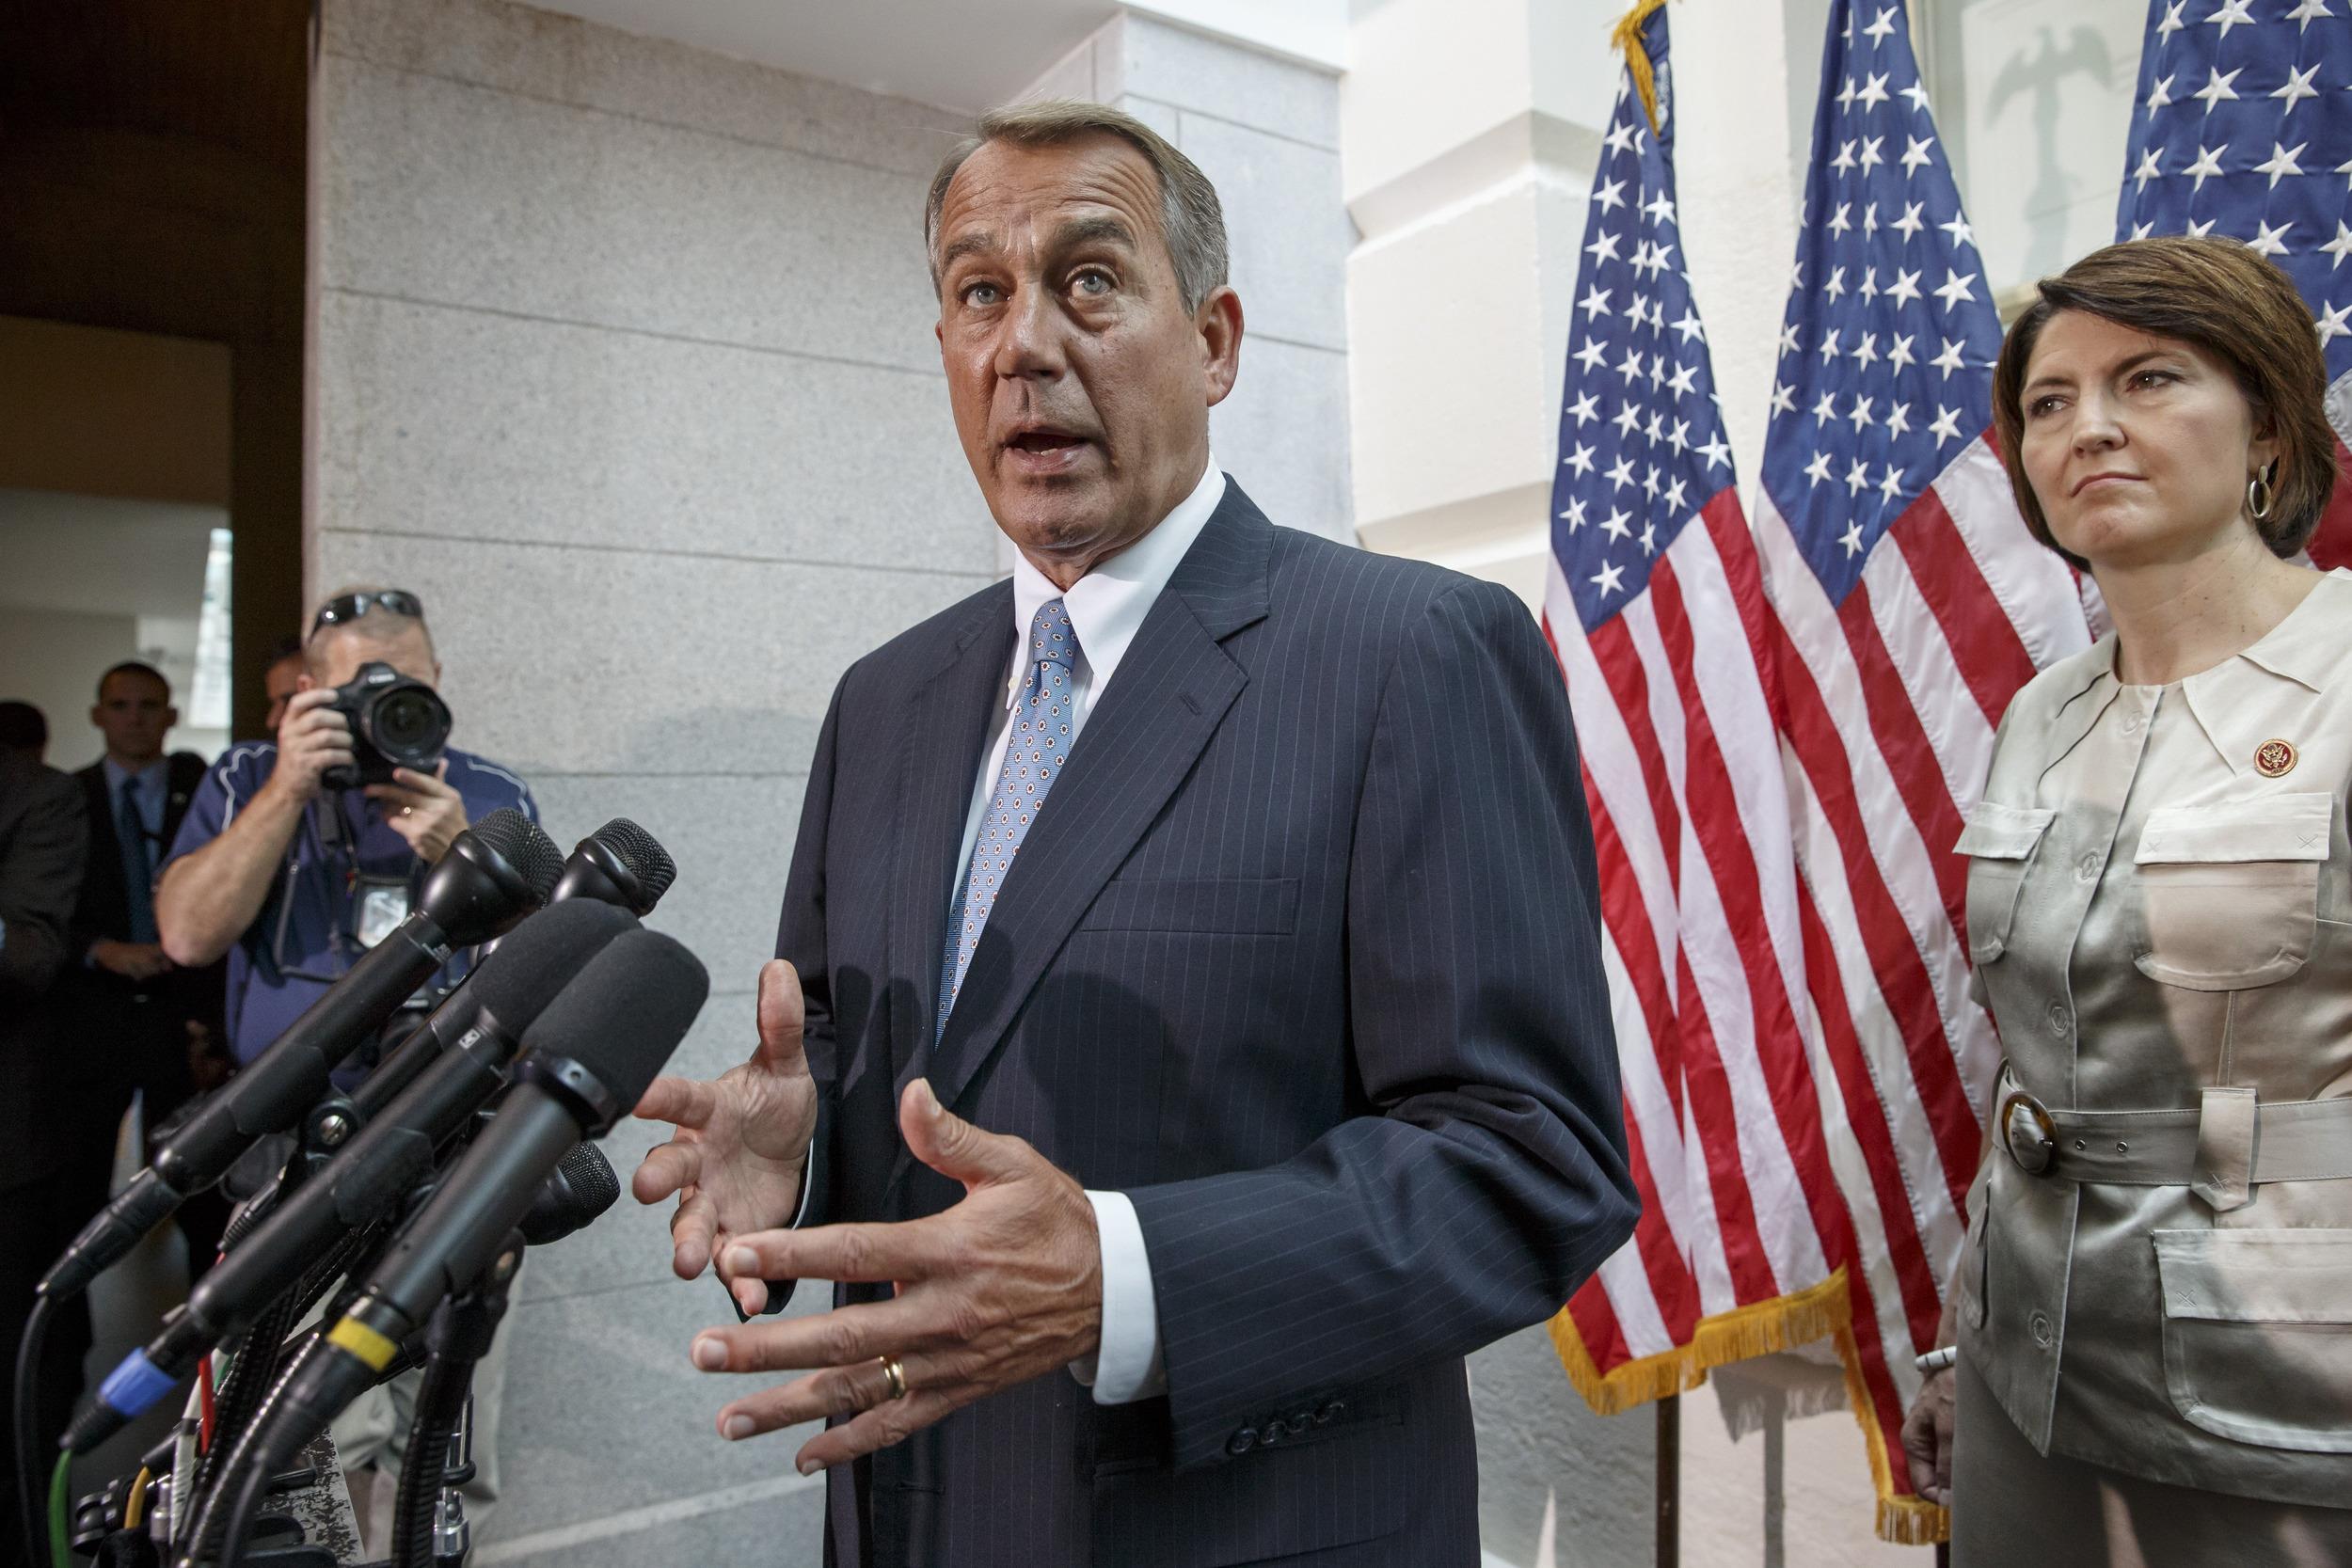 Image: John Boehner, Cathy McMorris Rodgers